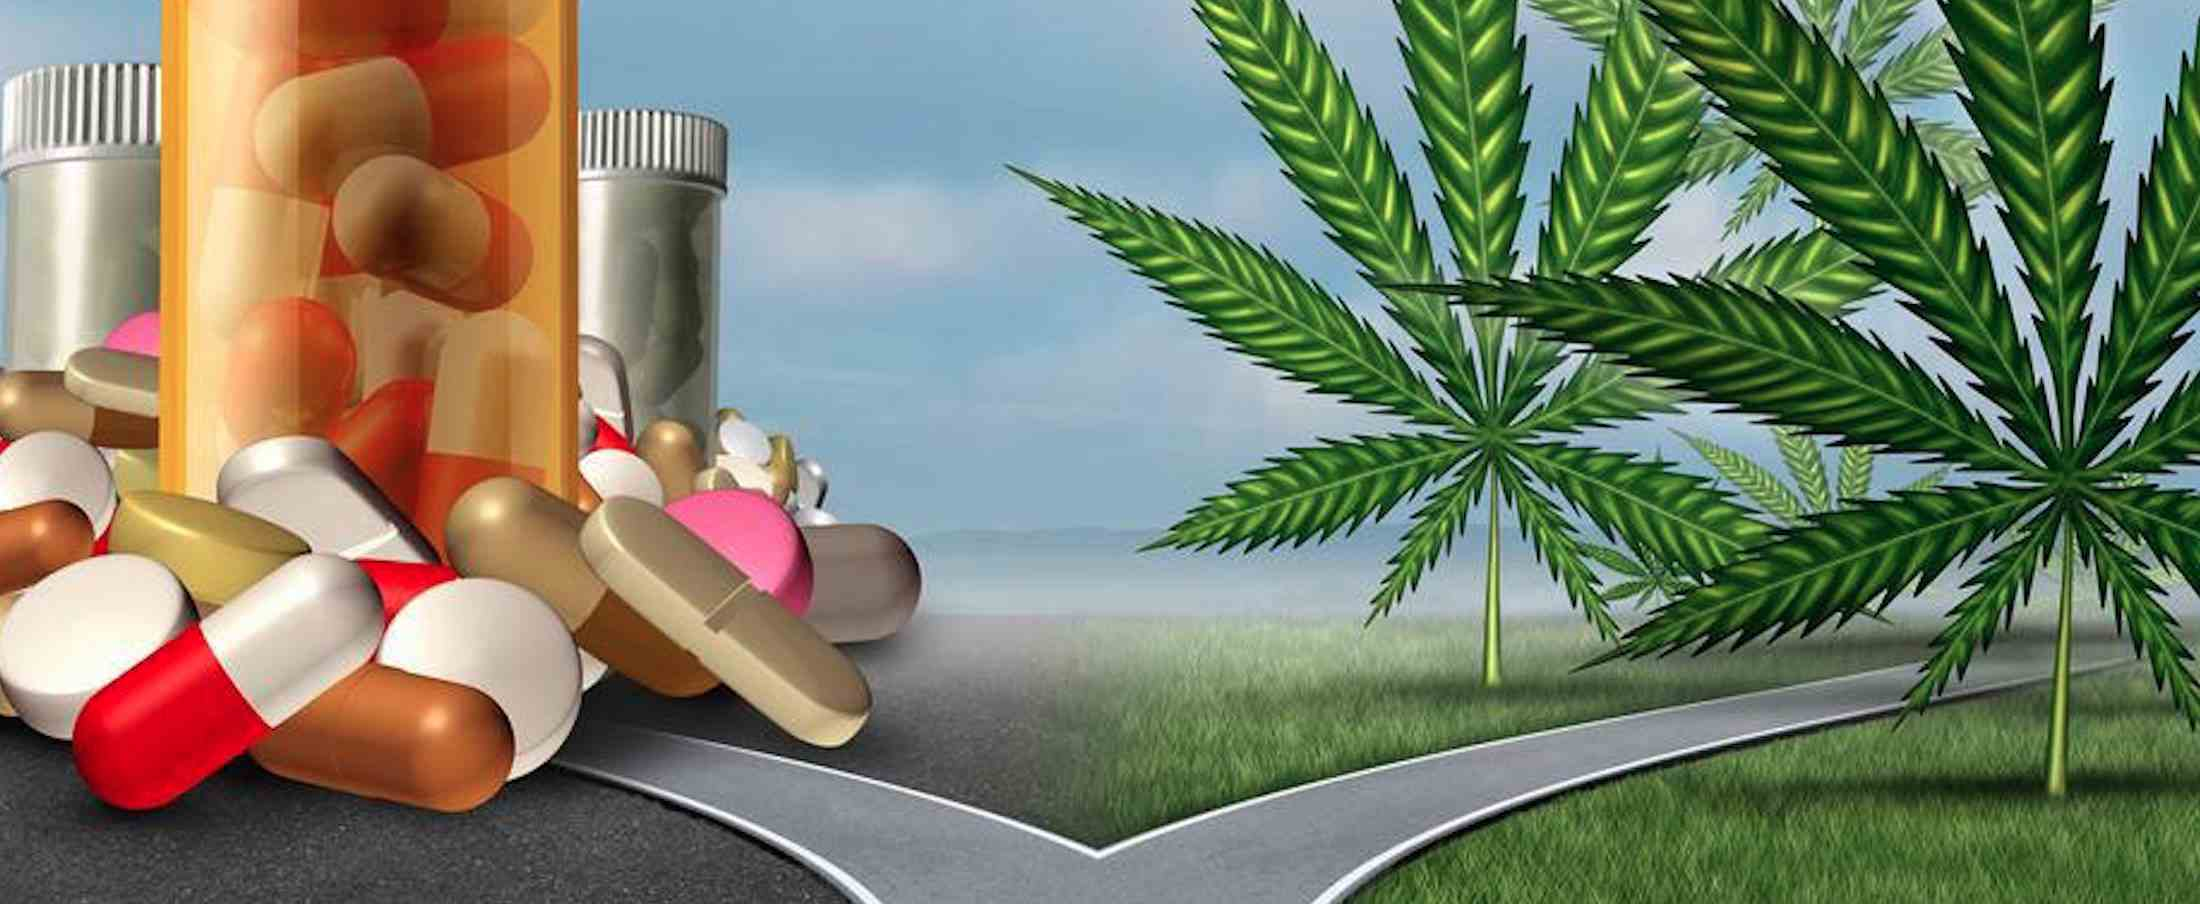 Painkiller addiction reduced with Cannabis